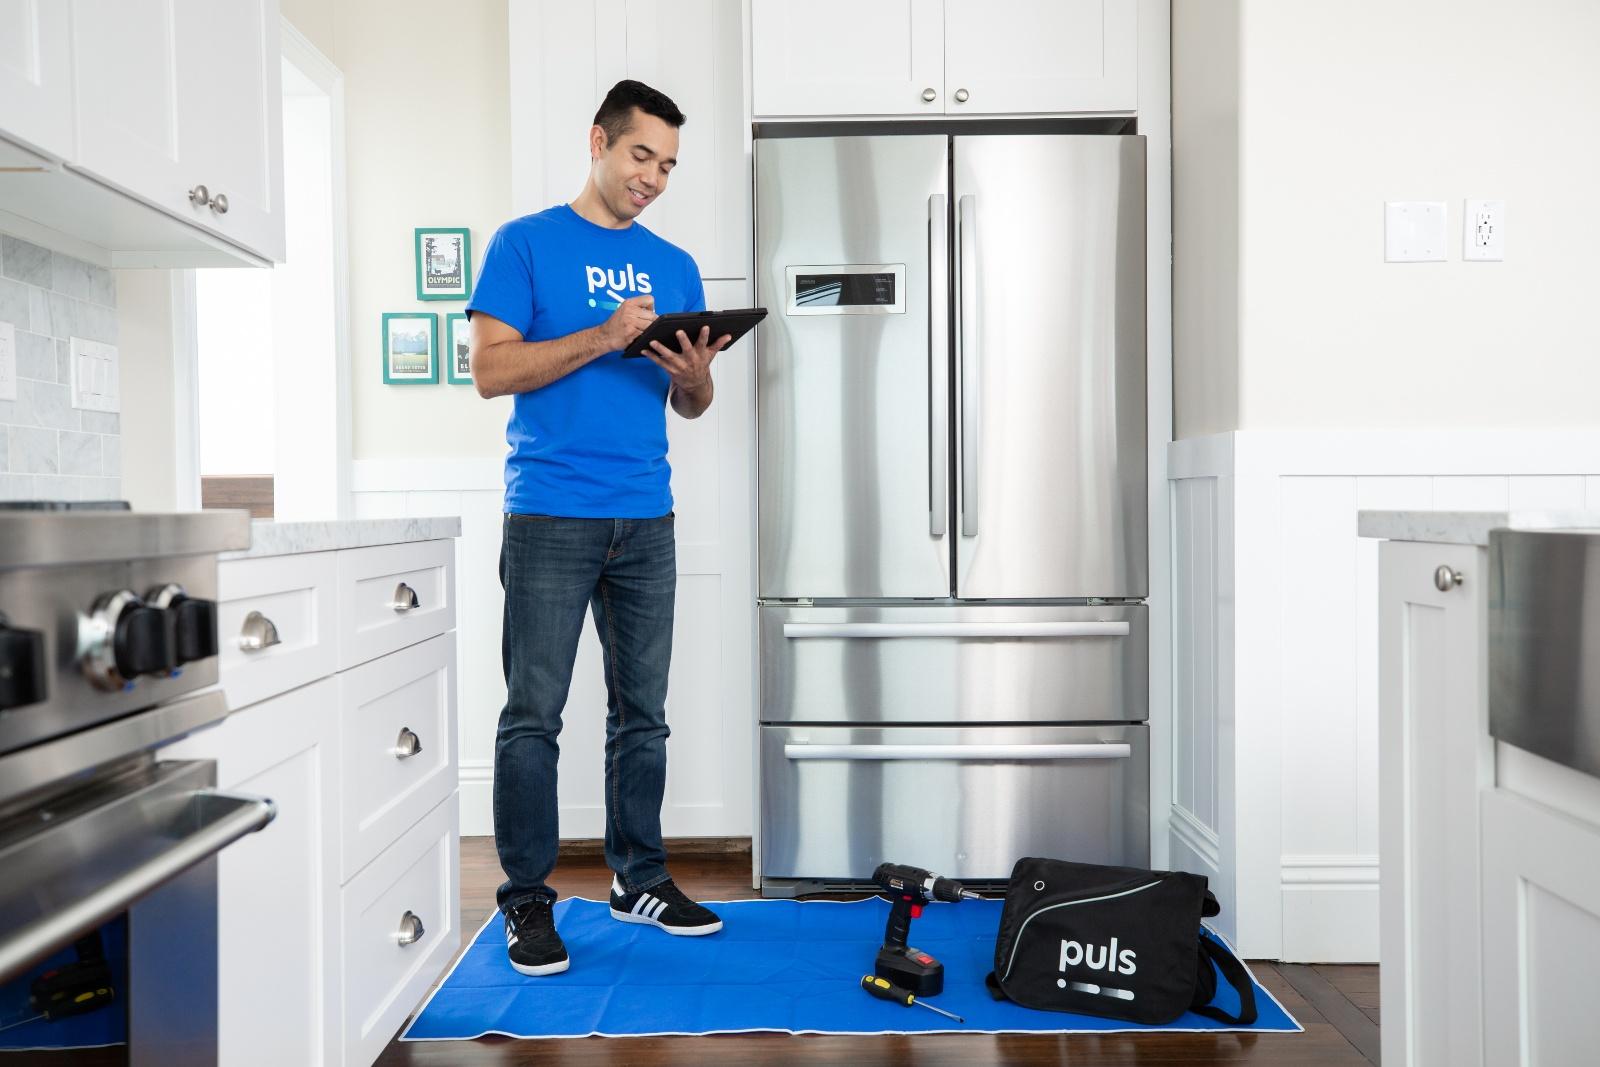 Puls refrigerator repair service